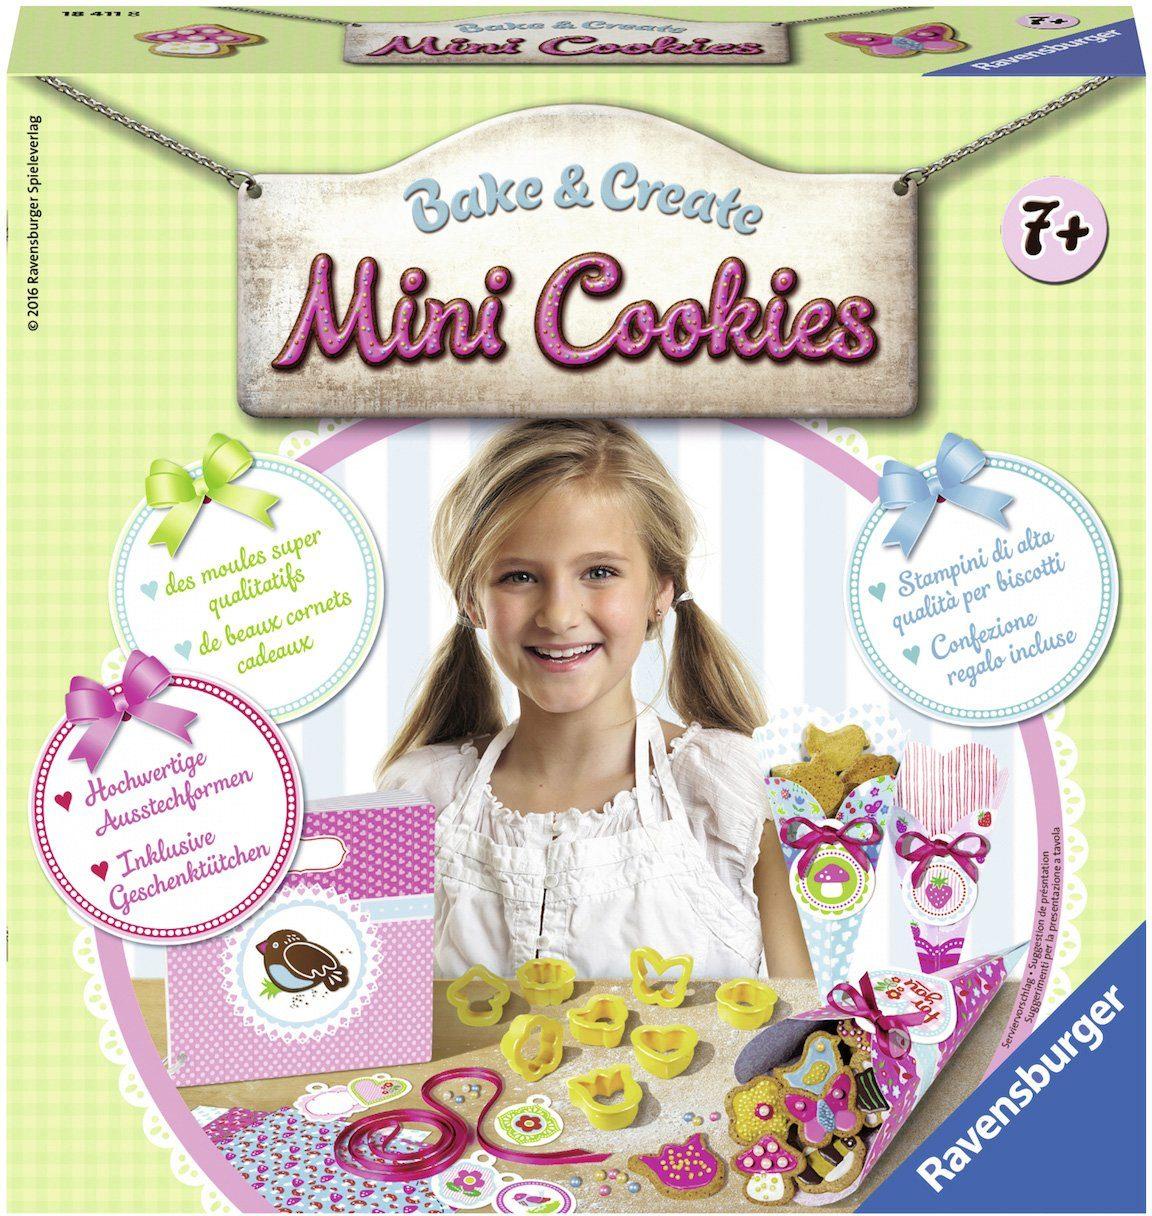 Ravensburger Set, »Bake & Create Mini Cookies«